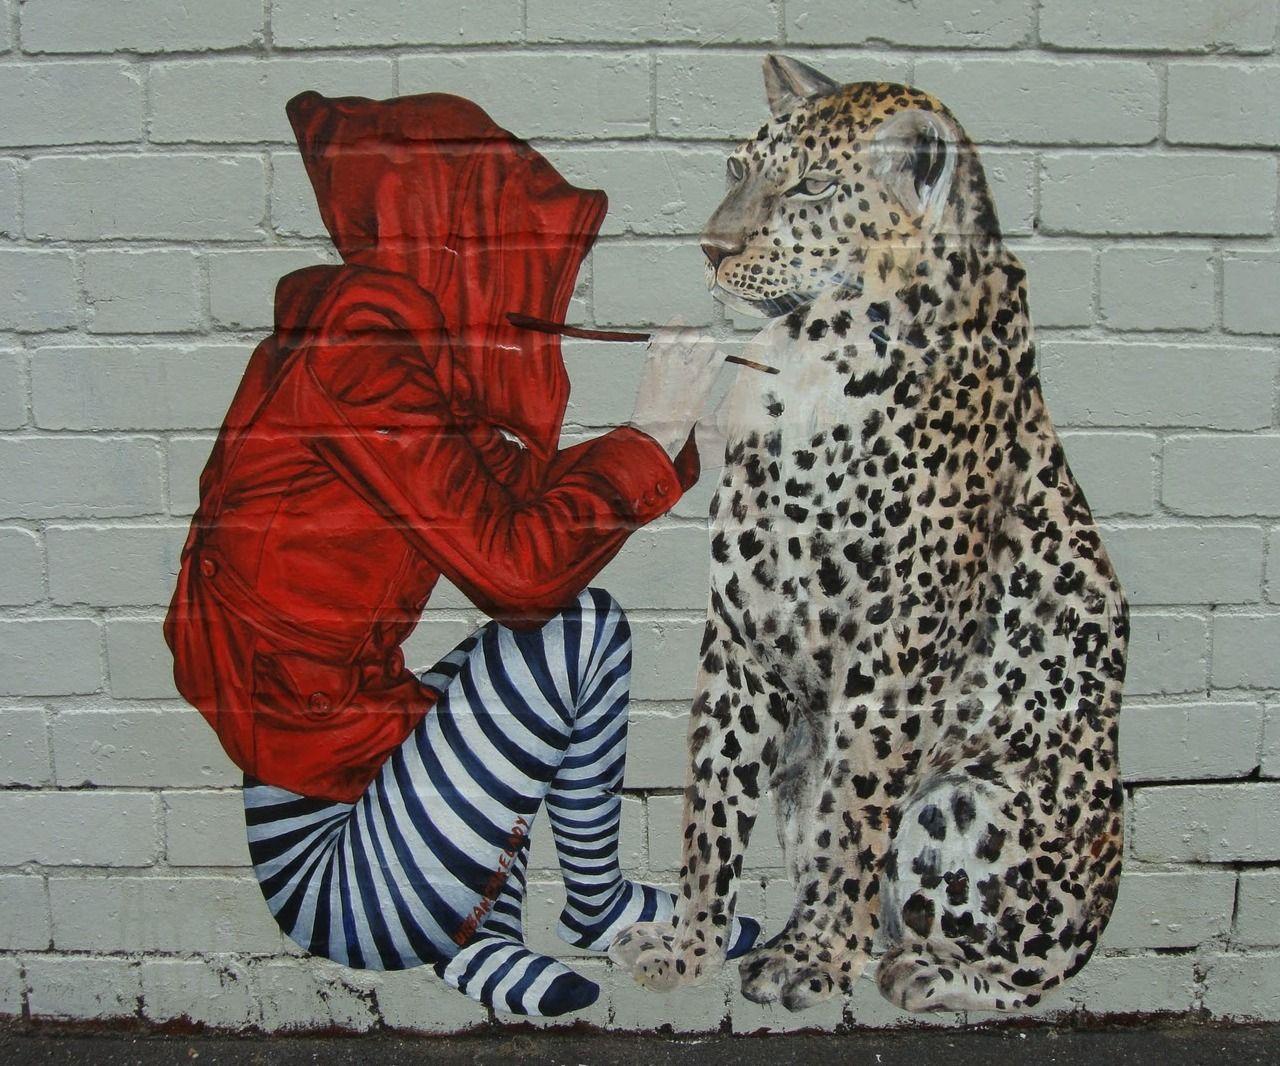 street art Melbourne, Australia